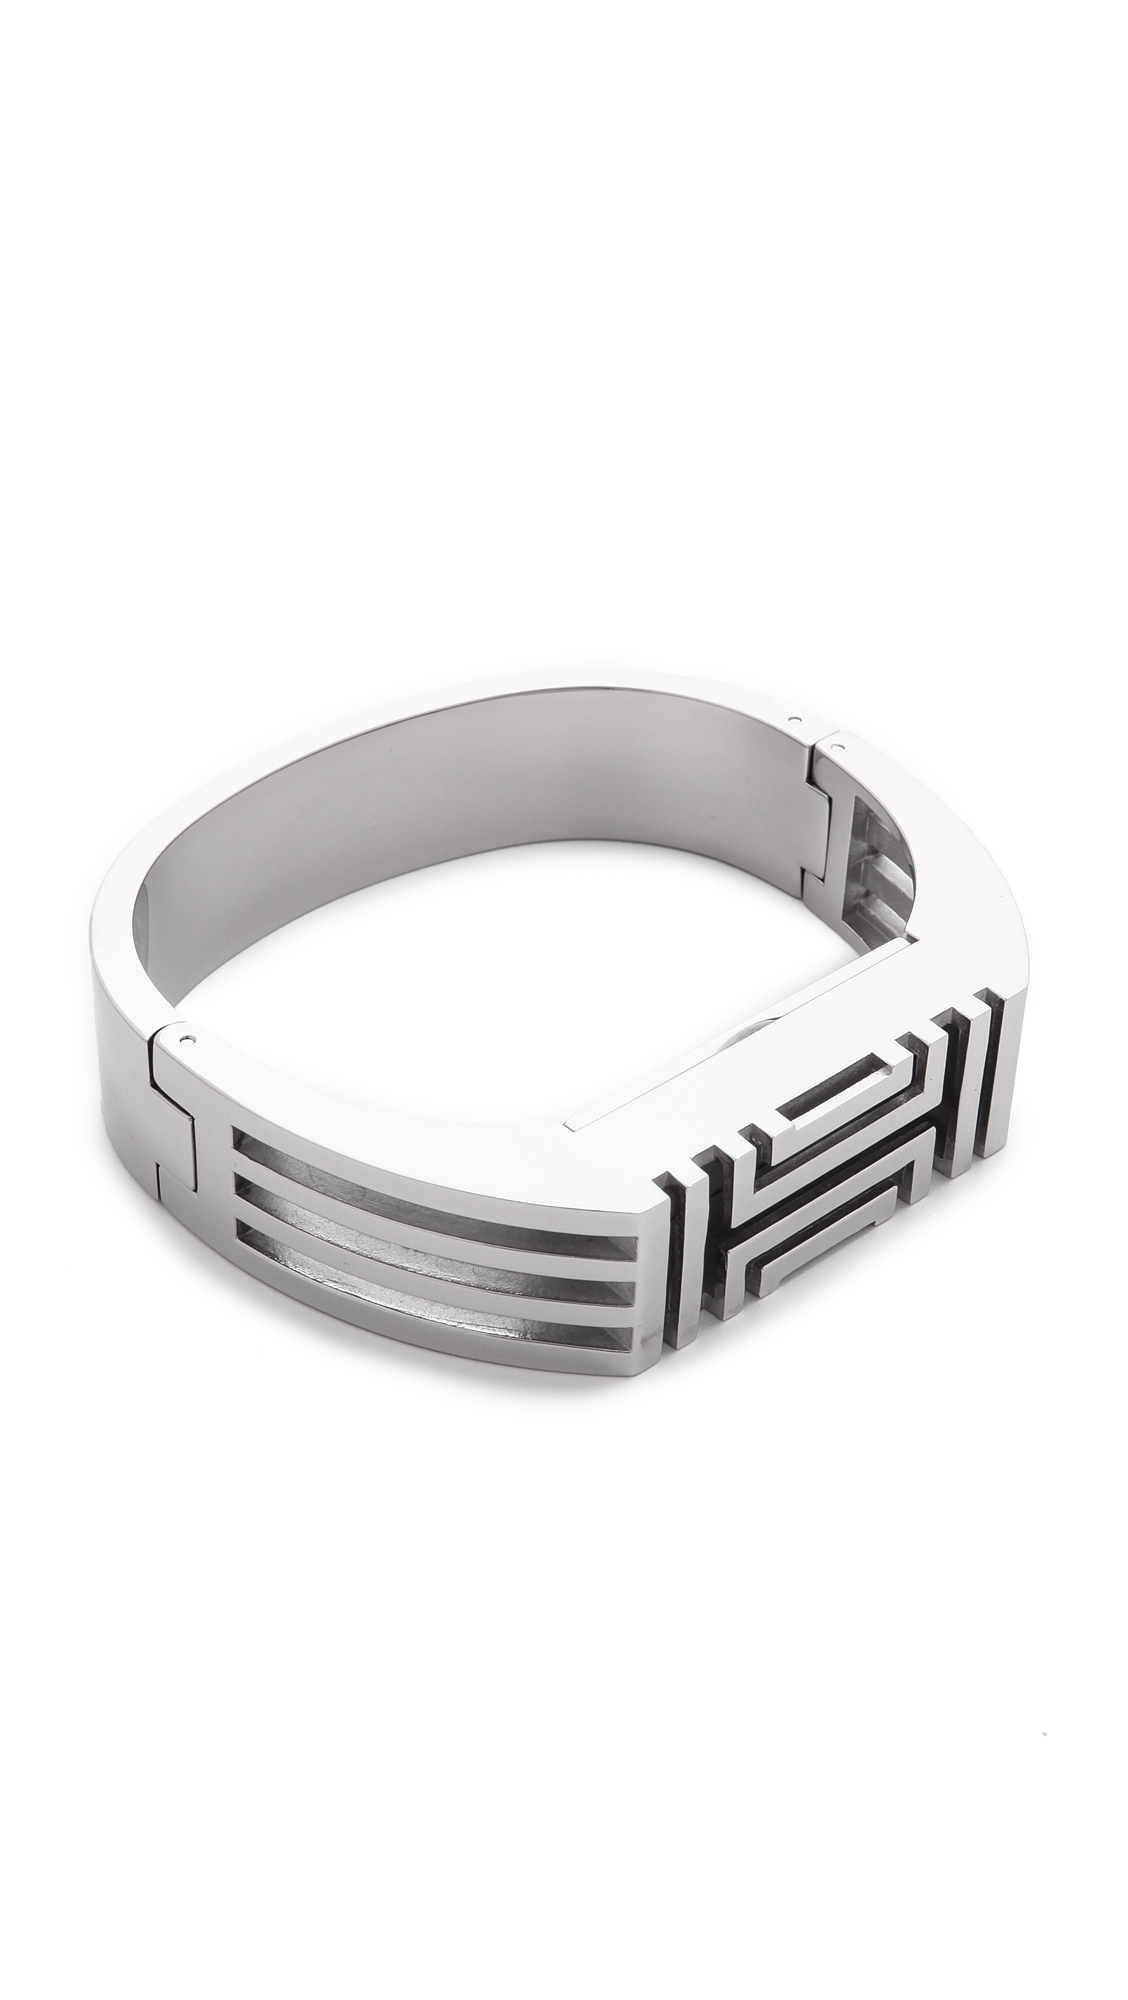 Lyst - Tory Burch For Fitbit Bracelet - Tory Silver in